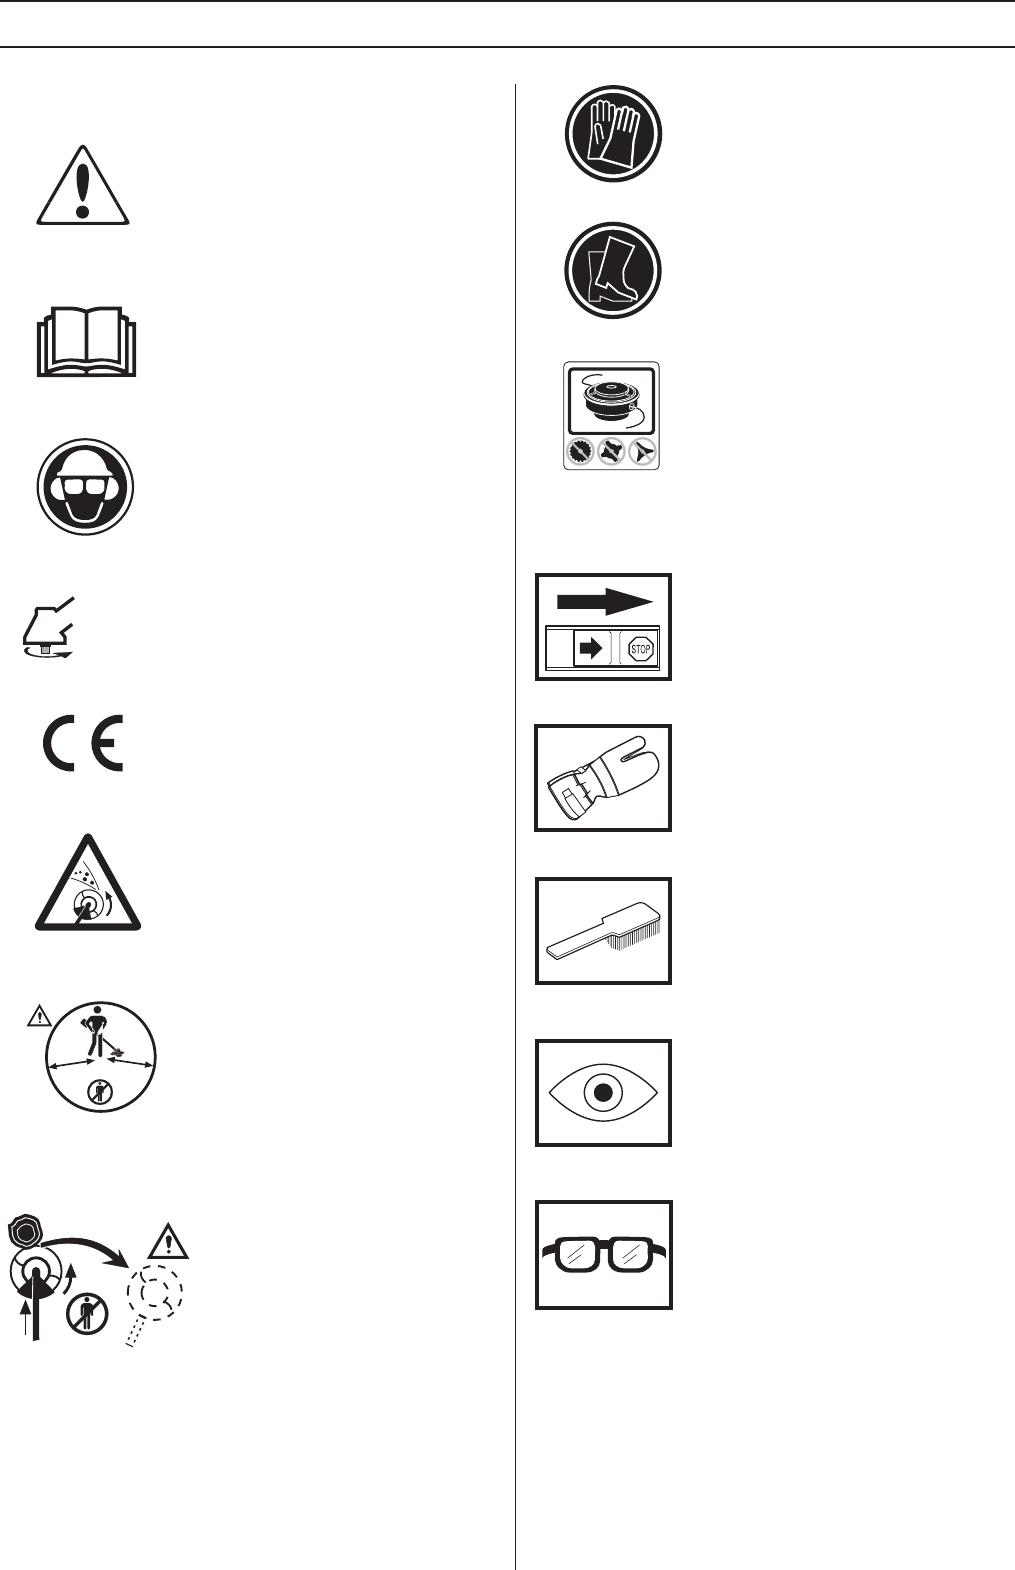 Husqvarna 232R 235R 235Fr Users Manual OM, 225 R, RD, RJ